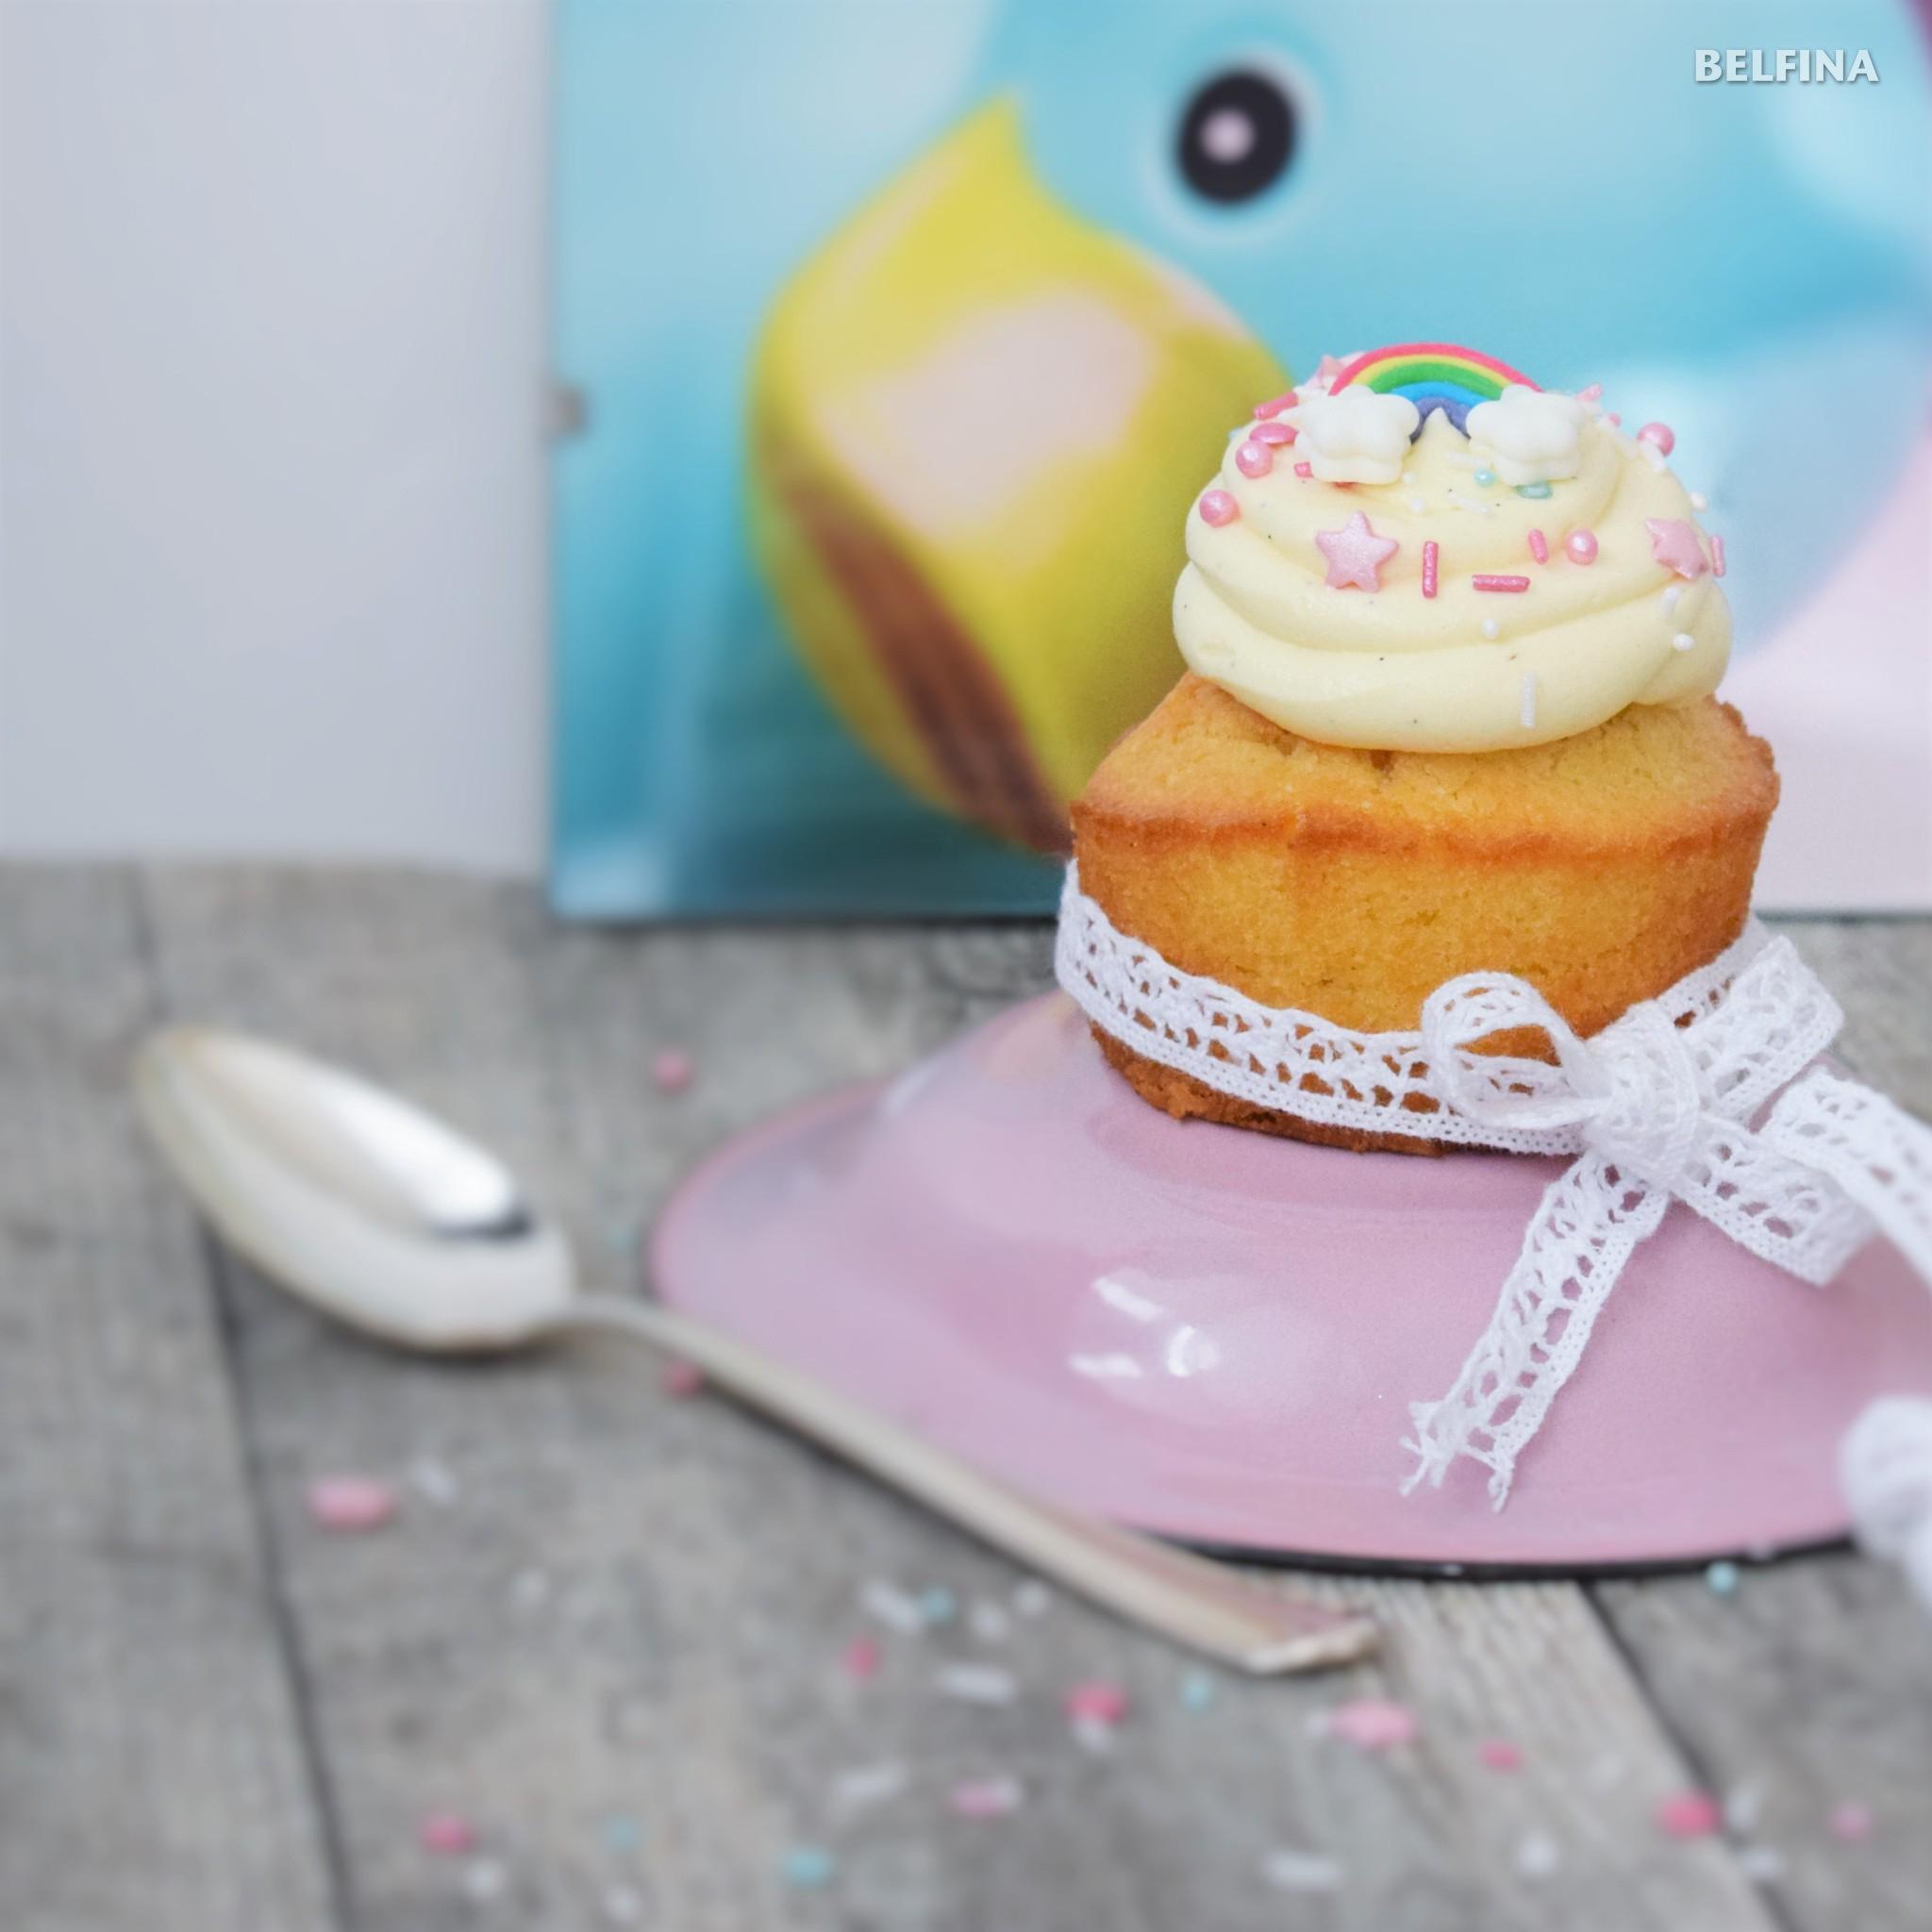 Mädchencupcakes